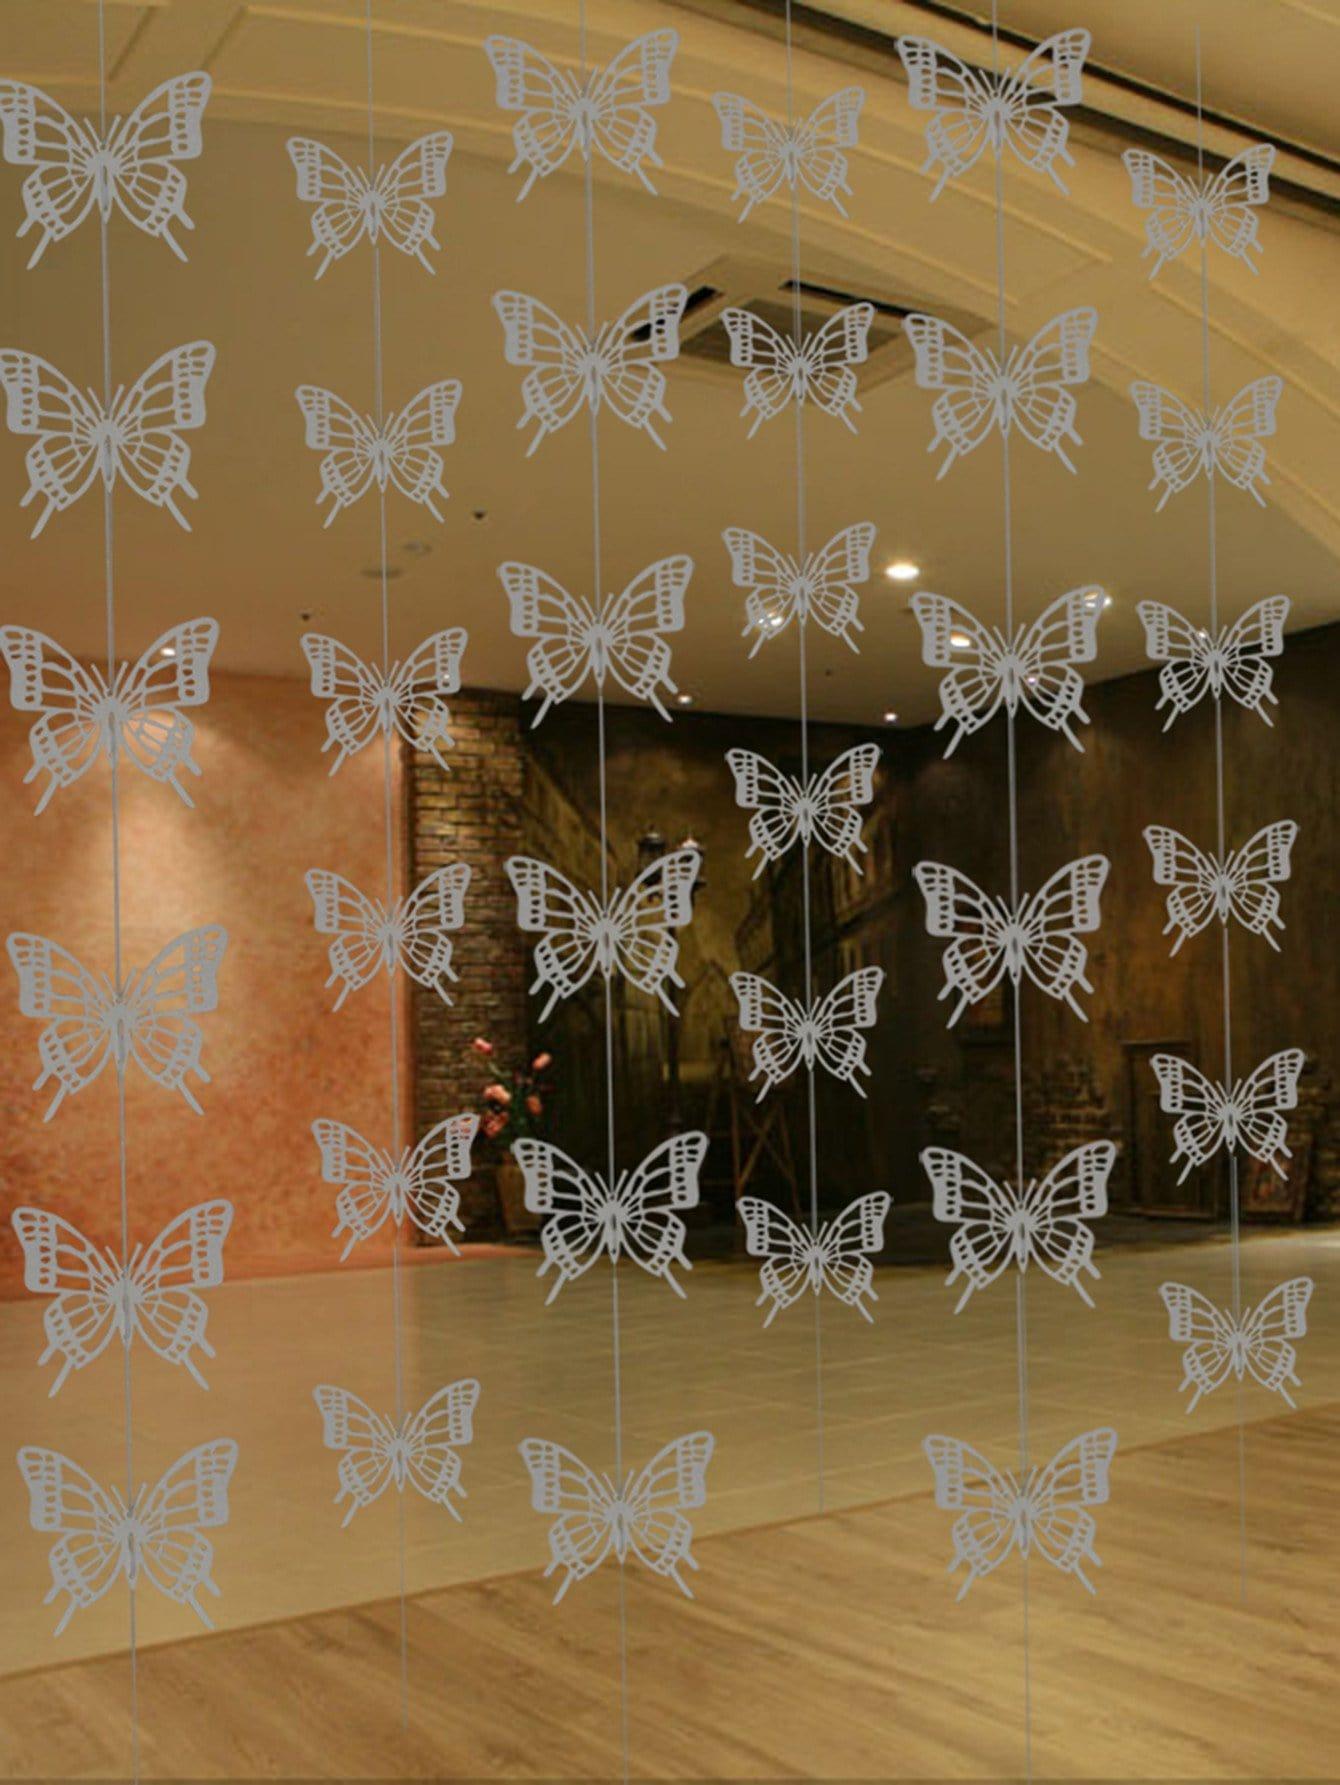 36pcs Schmetterling hängende Dekor & 6pcs Zeichenfolge